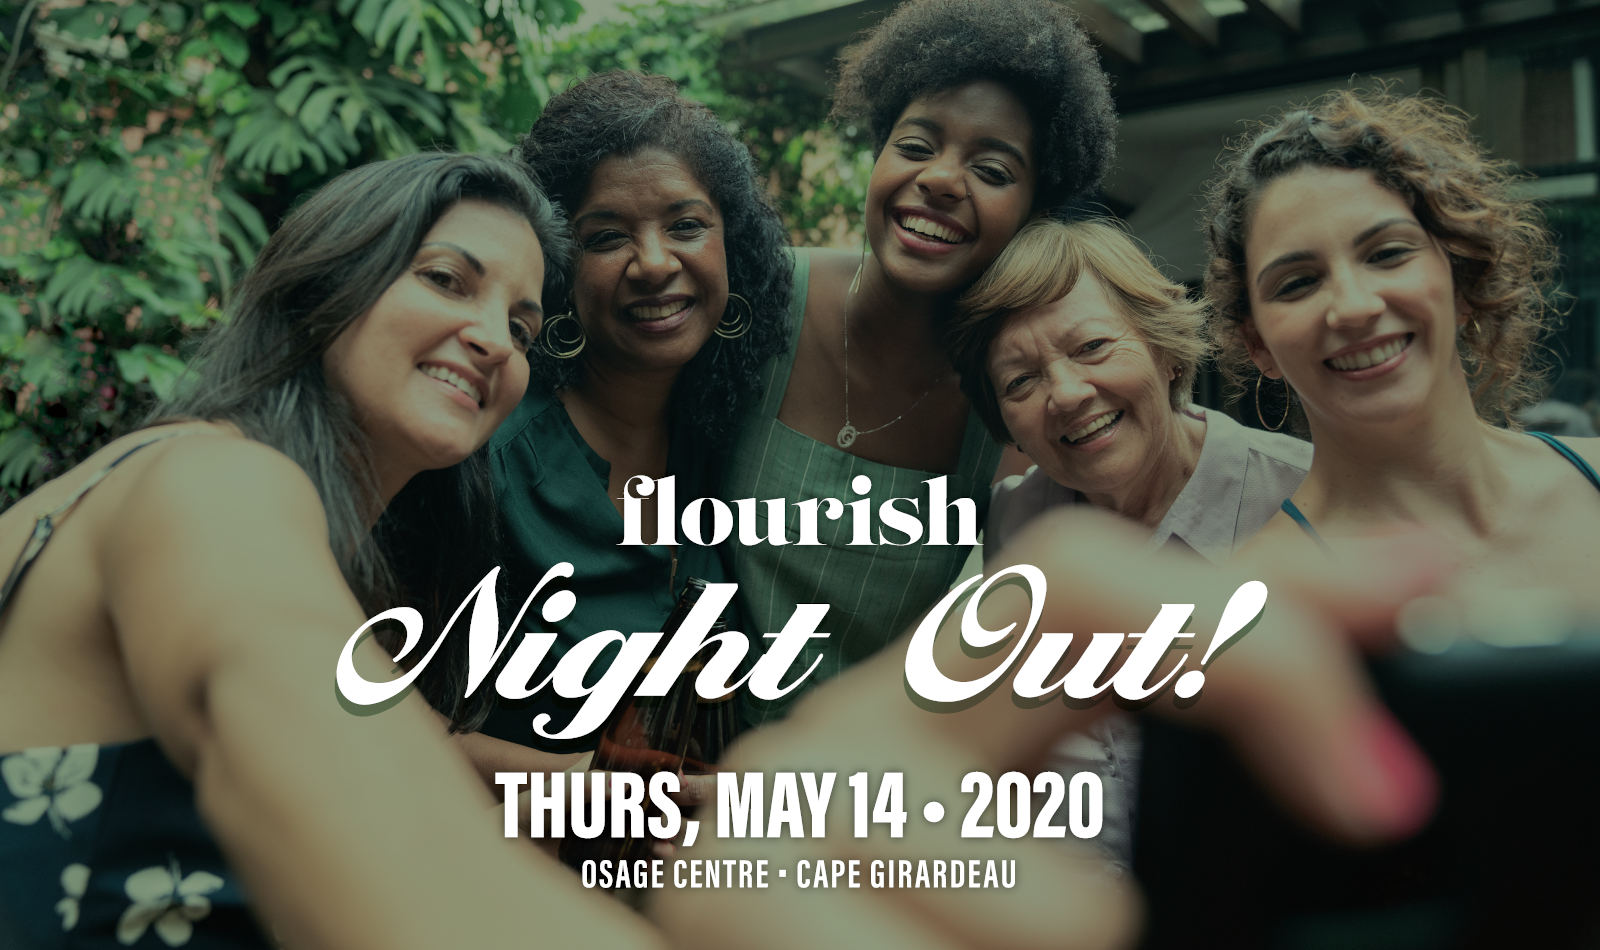 Flourish Night Out! Thursday, May 14, 2020, Osage Centre, Cape Girardeau